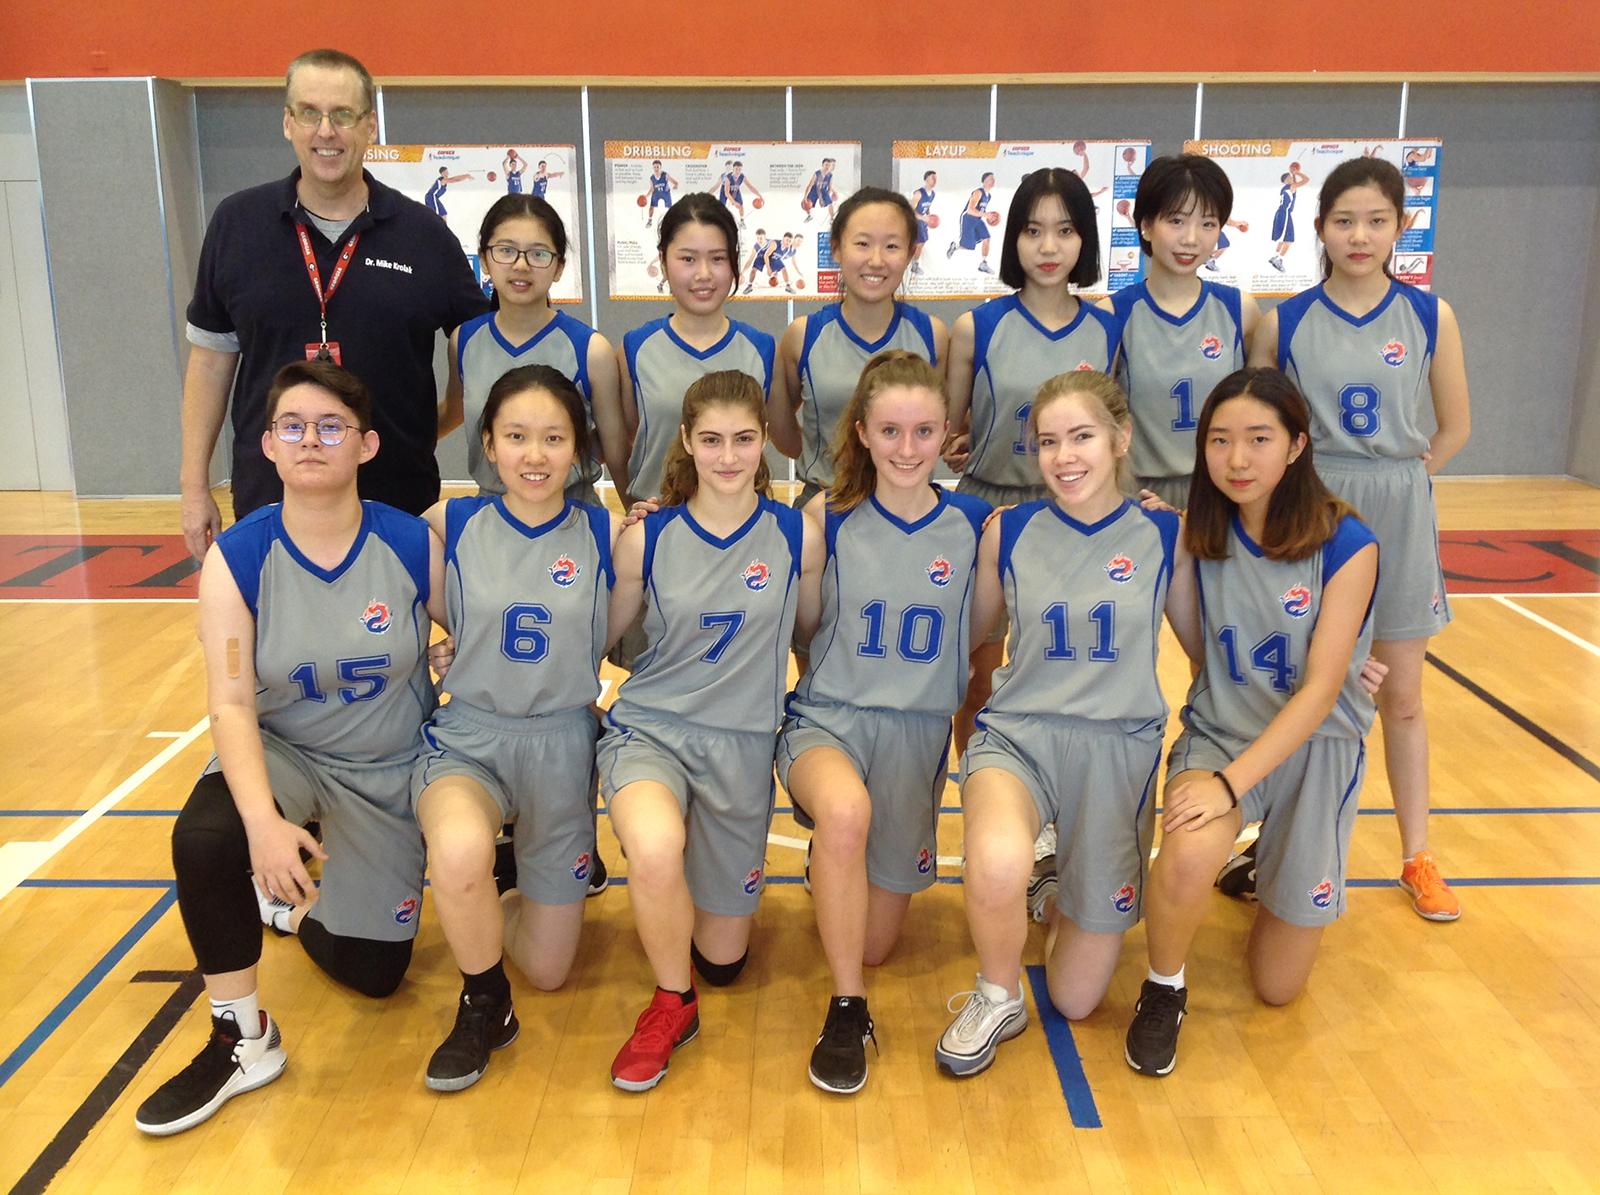 Suzhou Singapore International School (SSIS) - Girls